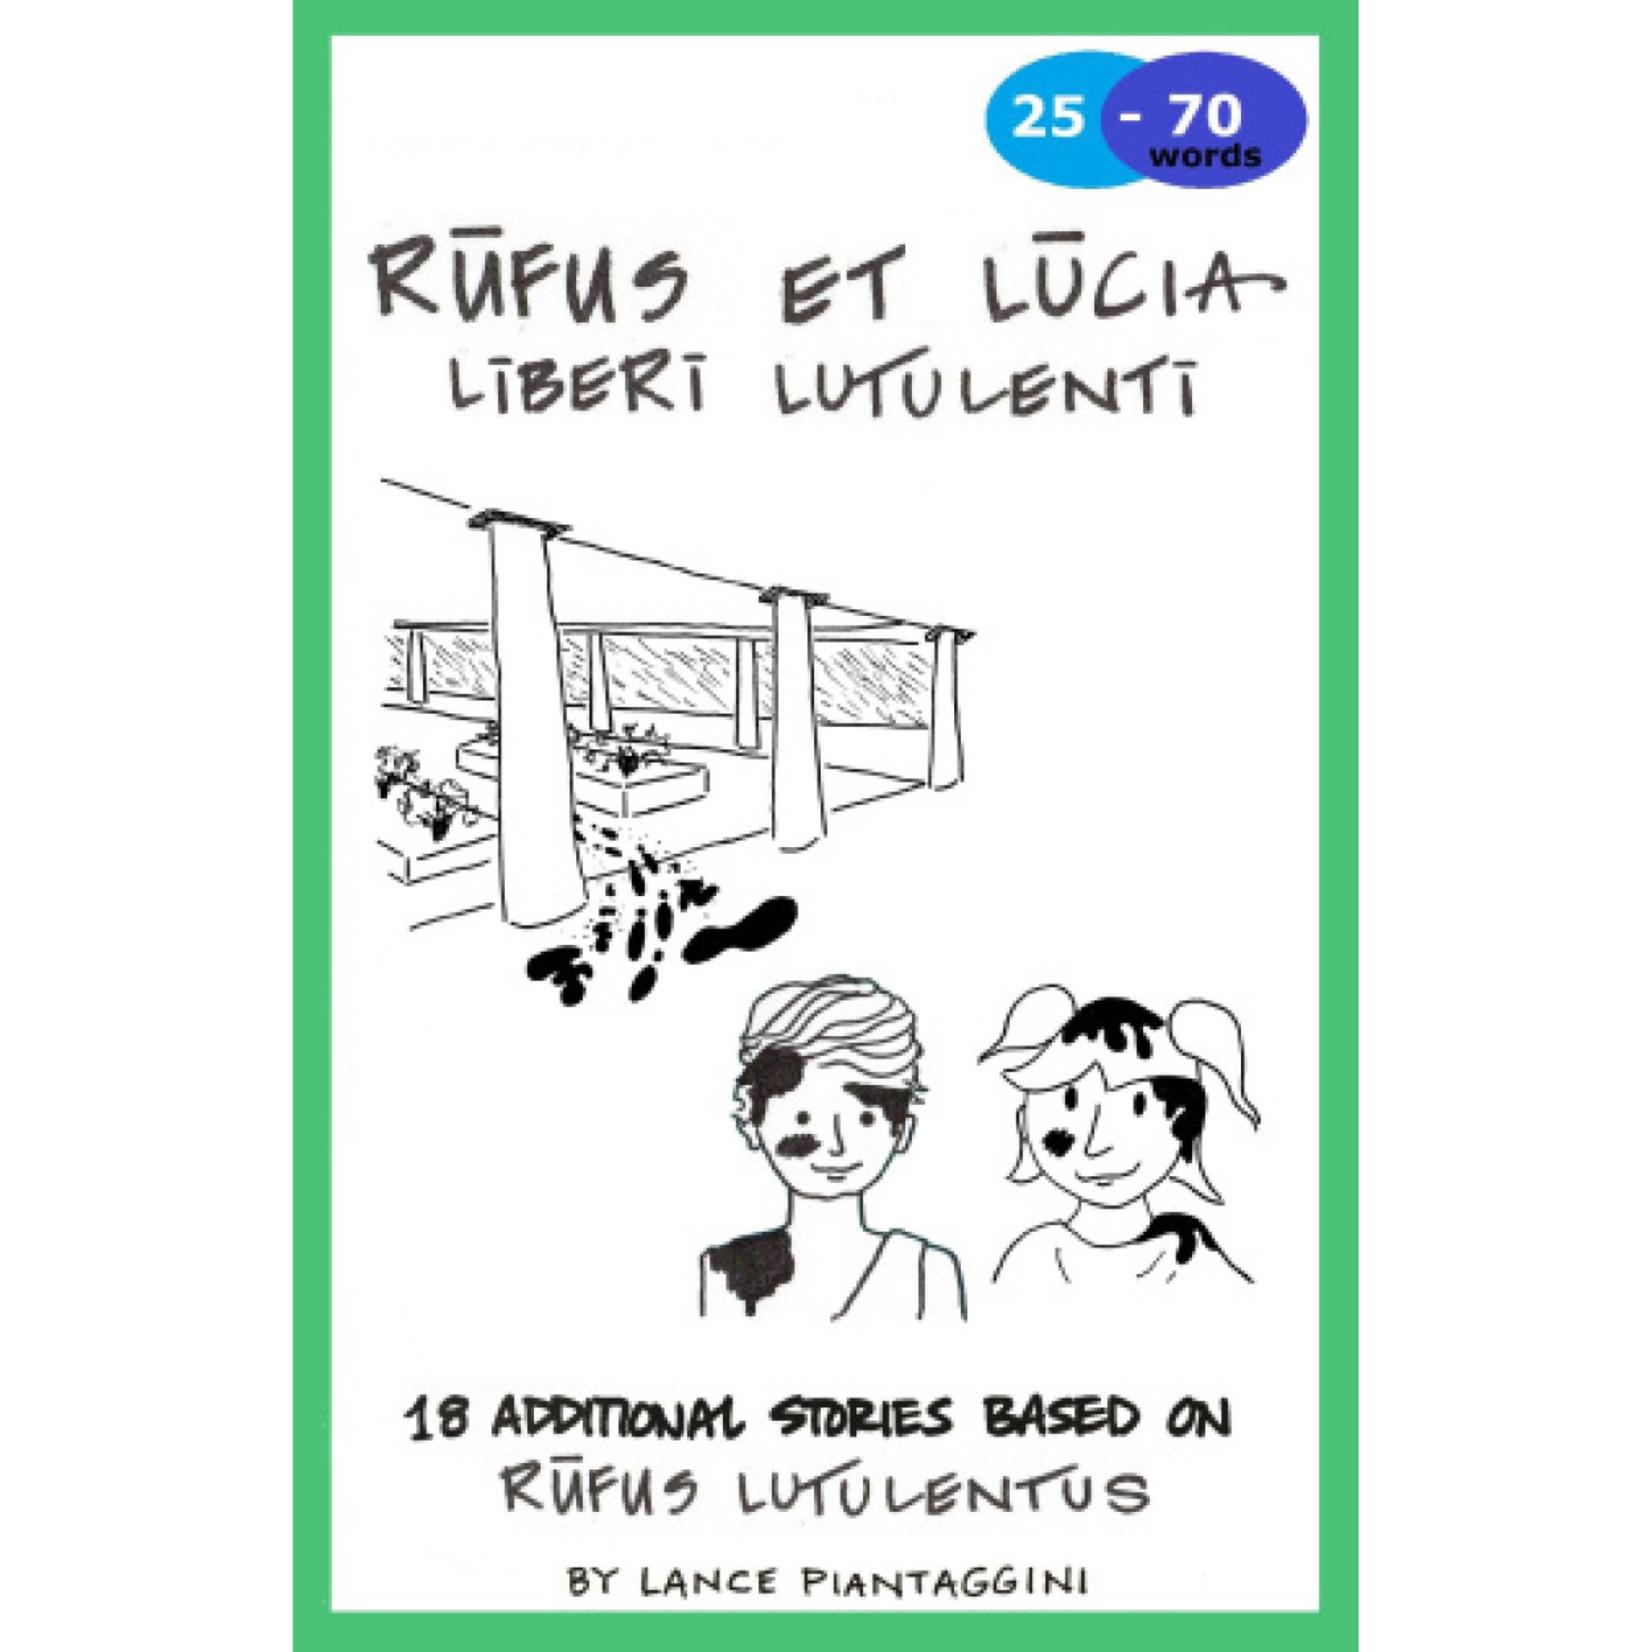 Magister P Rūfus et Lūcia: līberī lutulentī